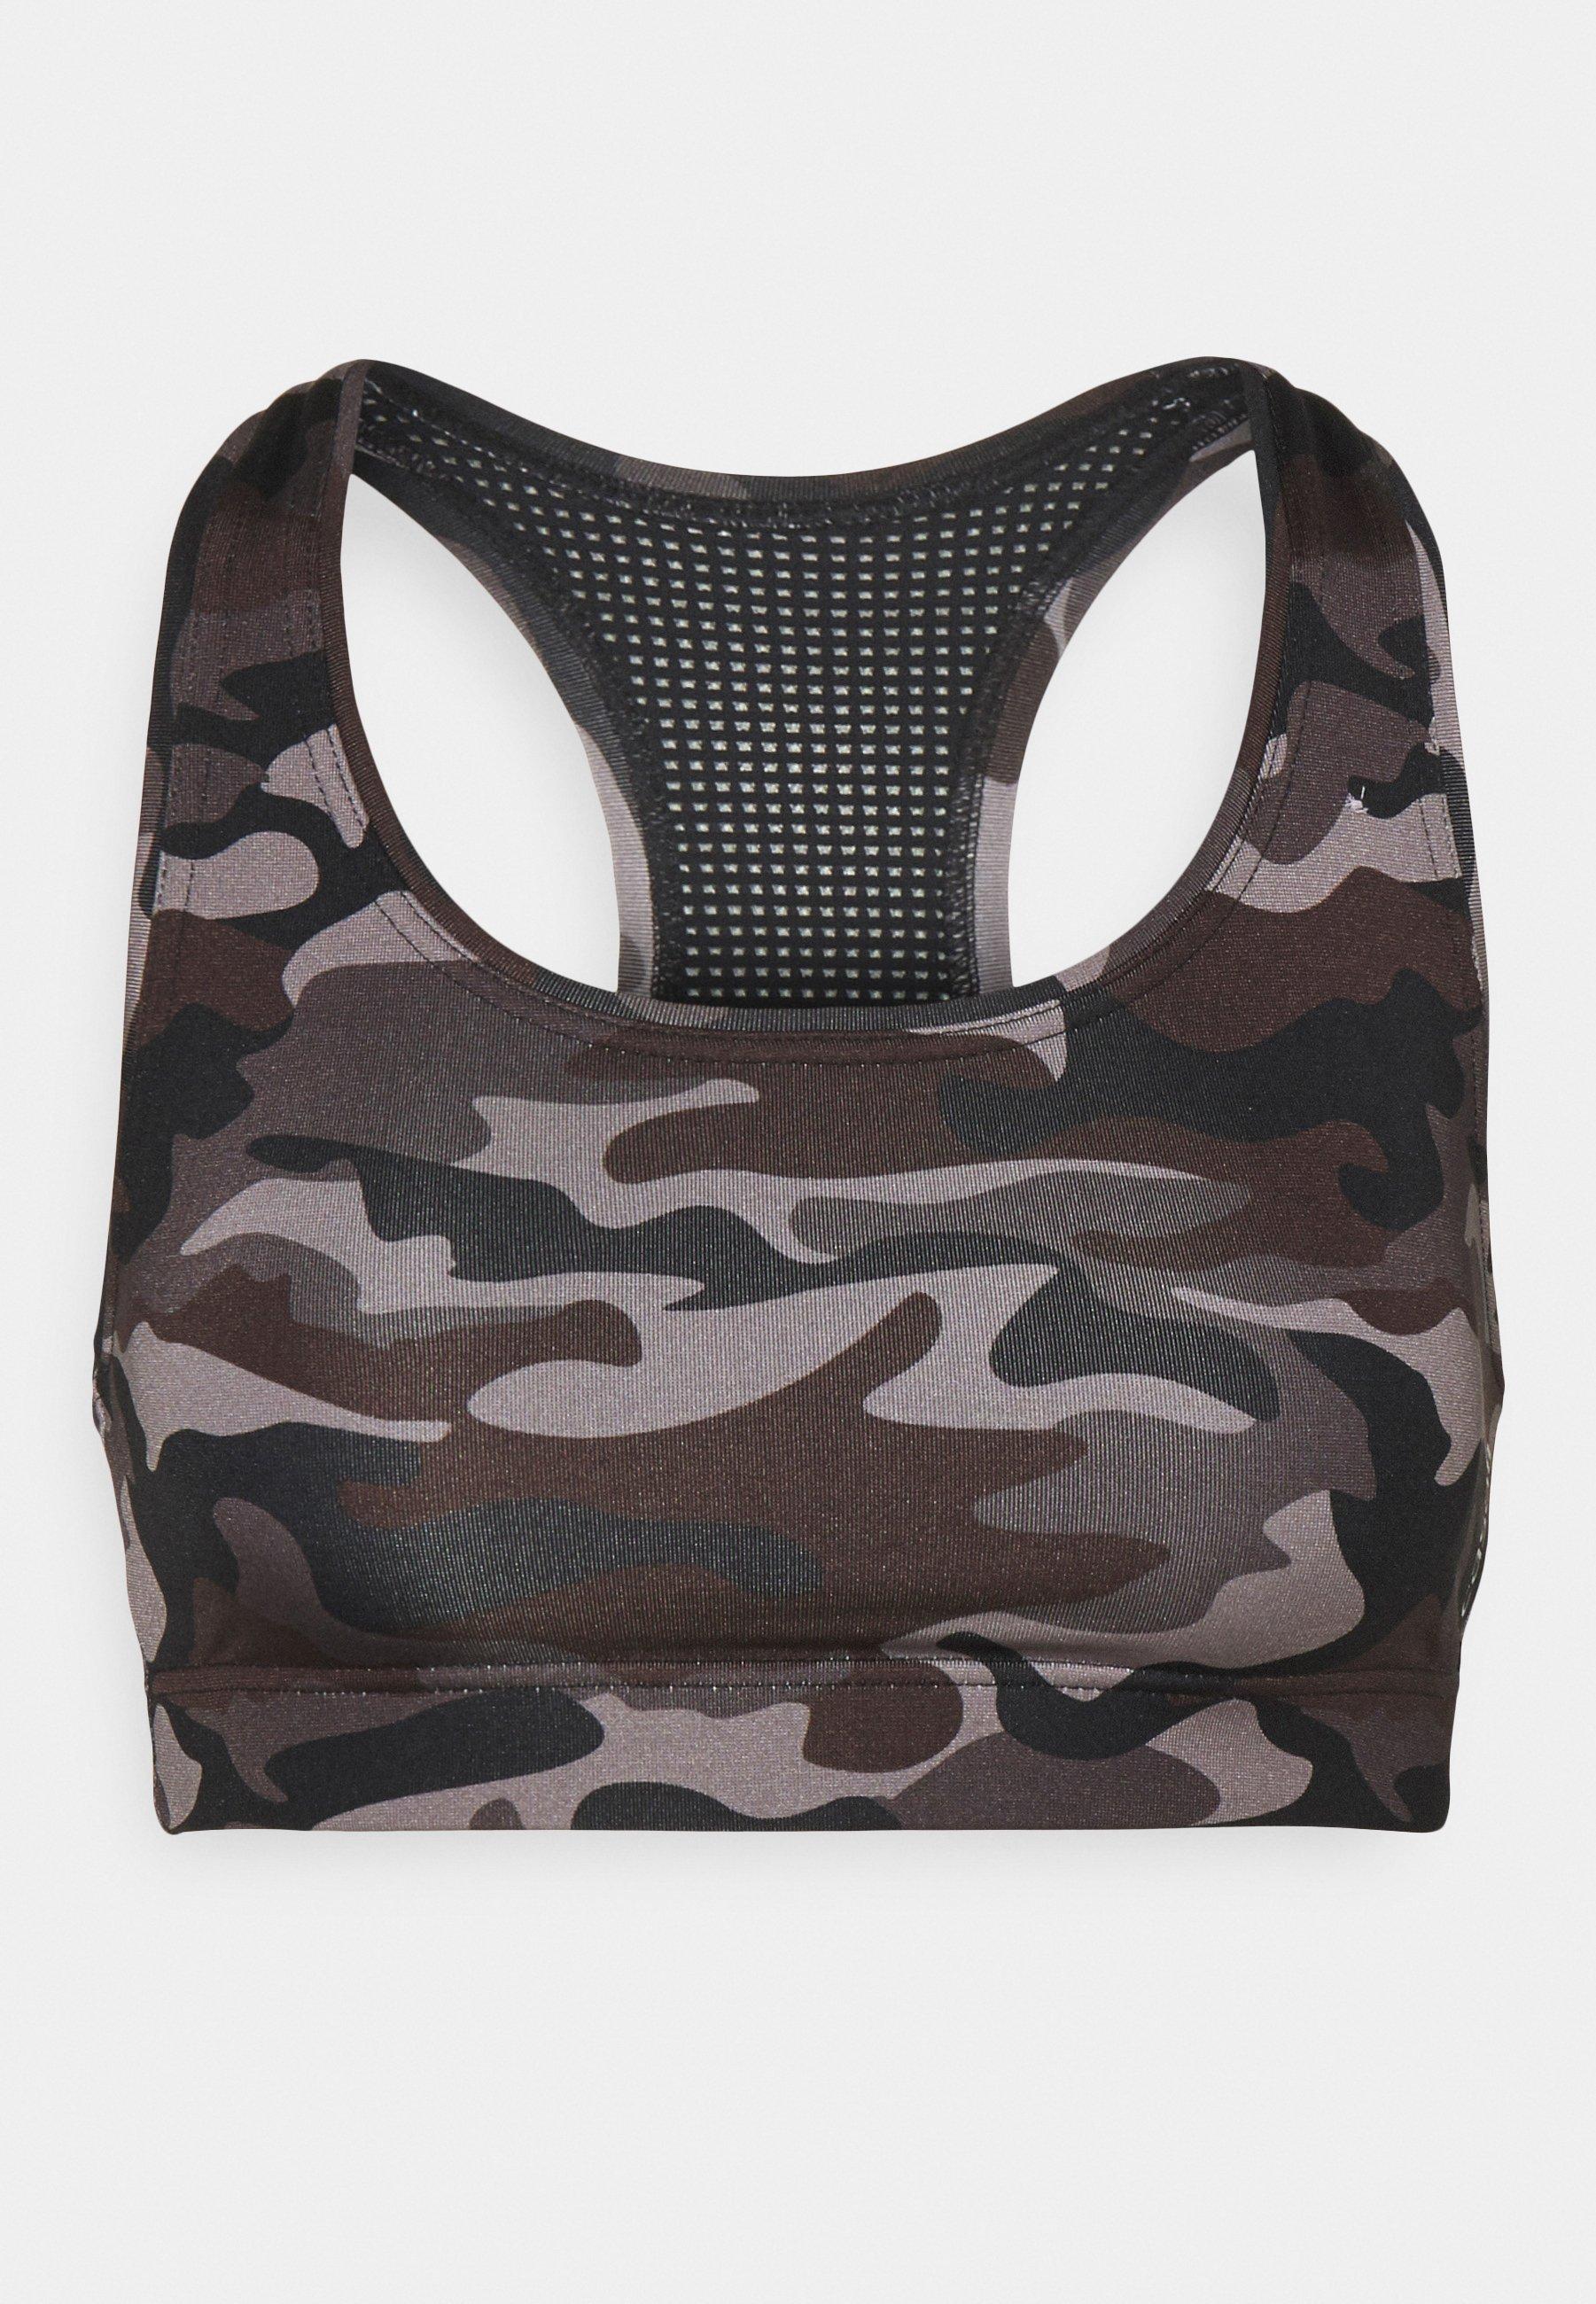 Women ICONIC SPORTS BRA - Medium support sports bra